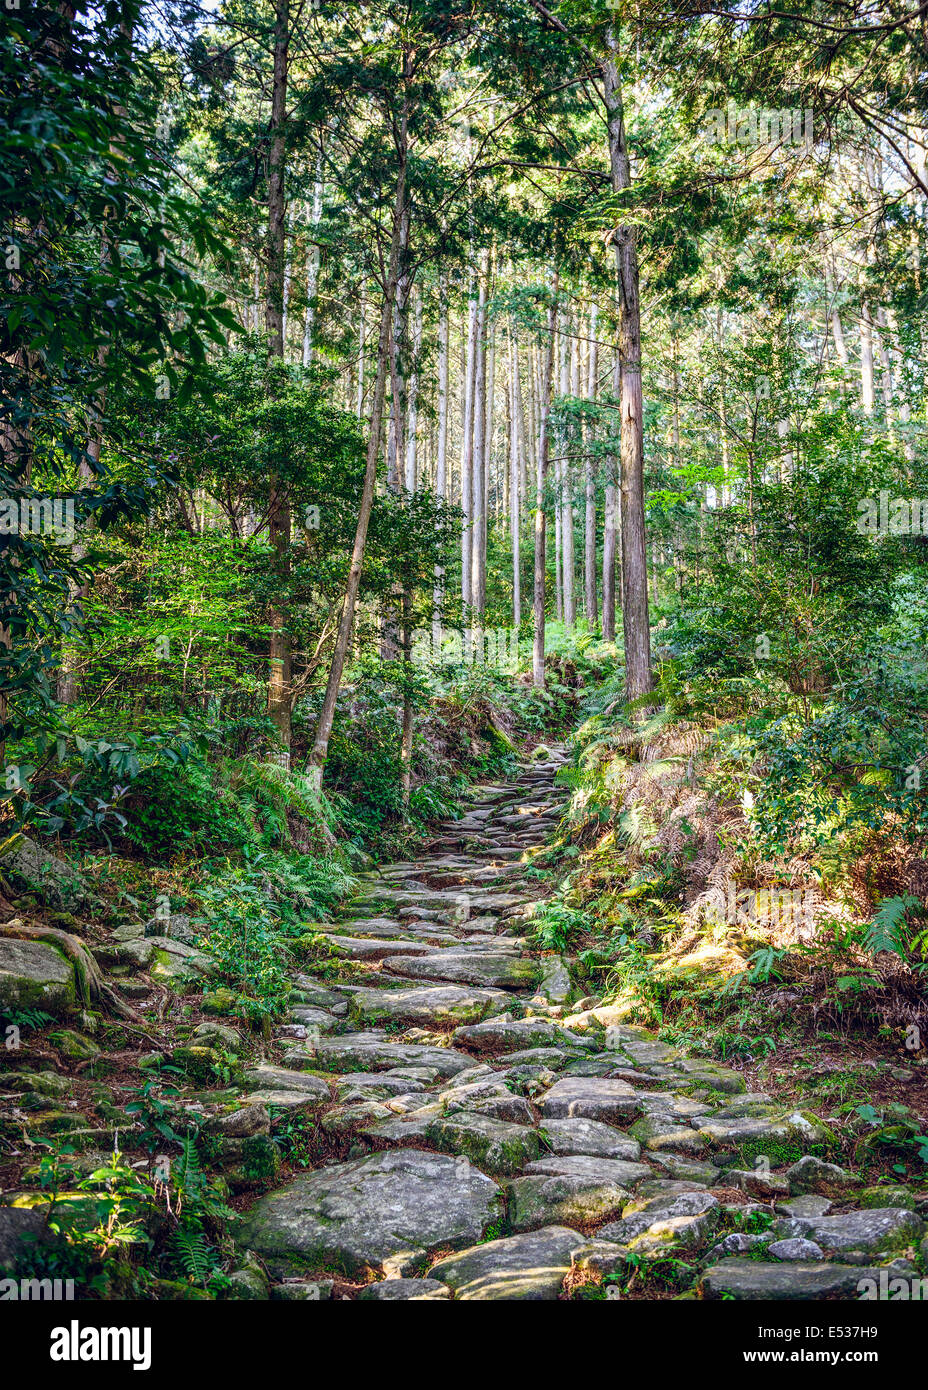 Kumano, Japan at Matsumoto Pass. The pass is part of the Kumano Kodo, a series of ancient pilgrimage routes. - Stock Image